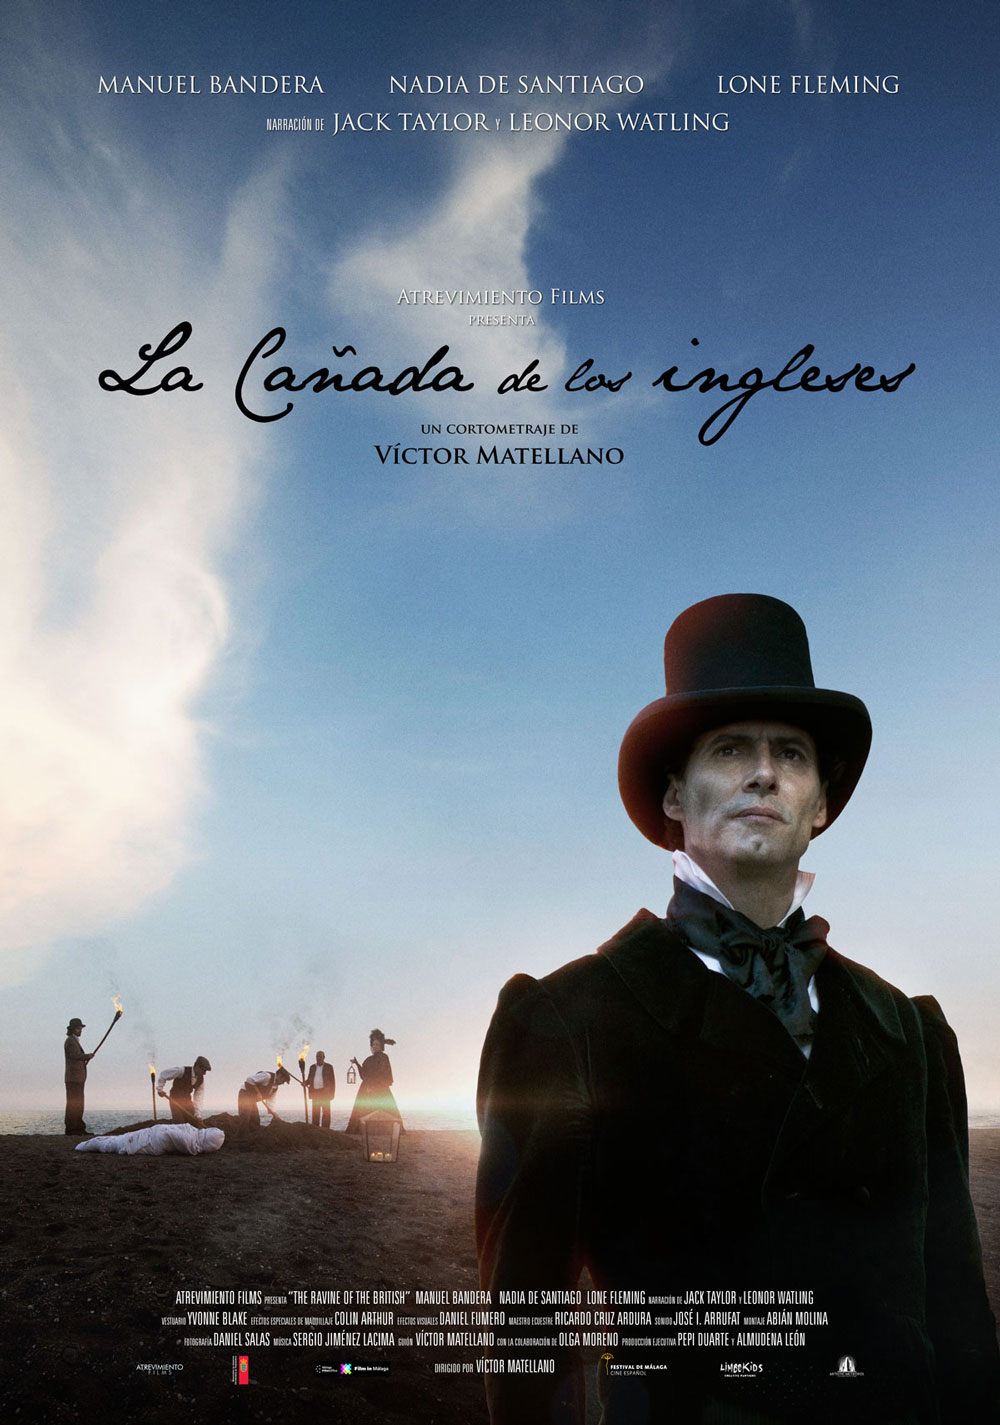 La Cañada de los Ingleses. Limbo KIDS